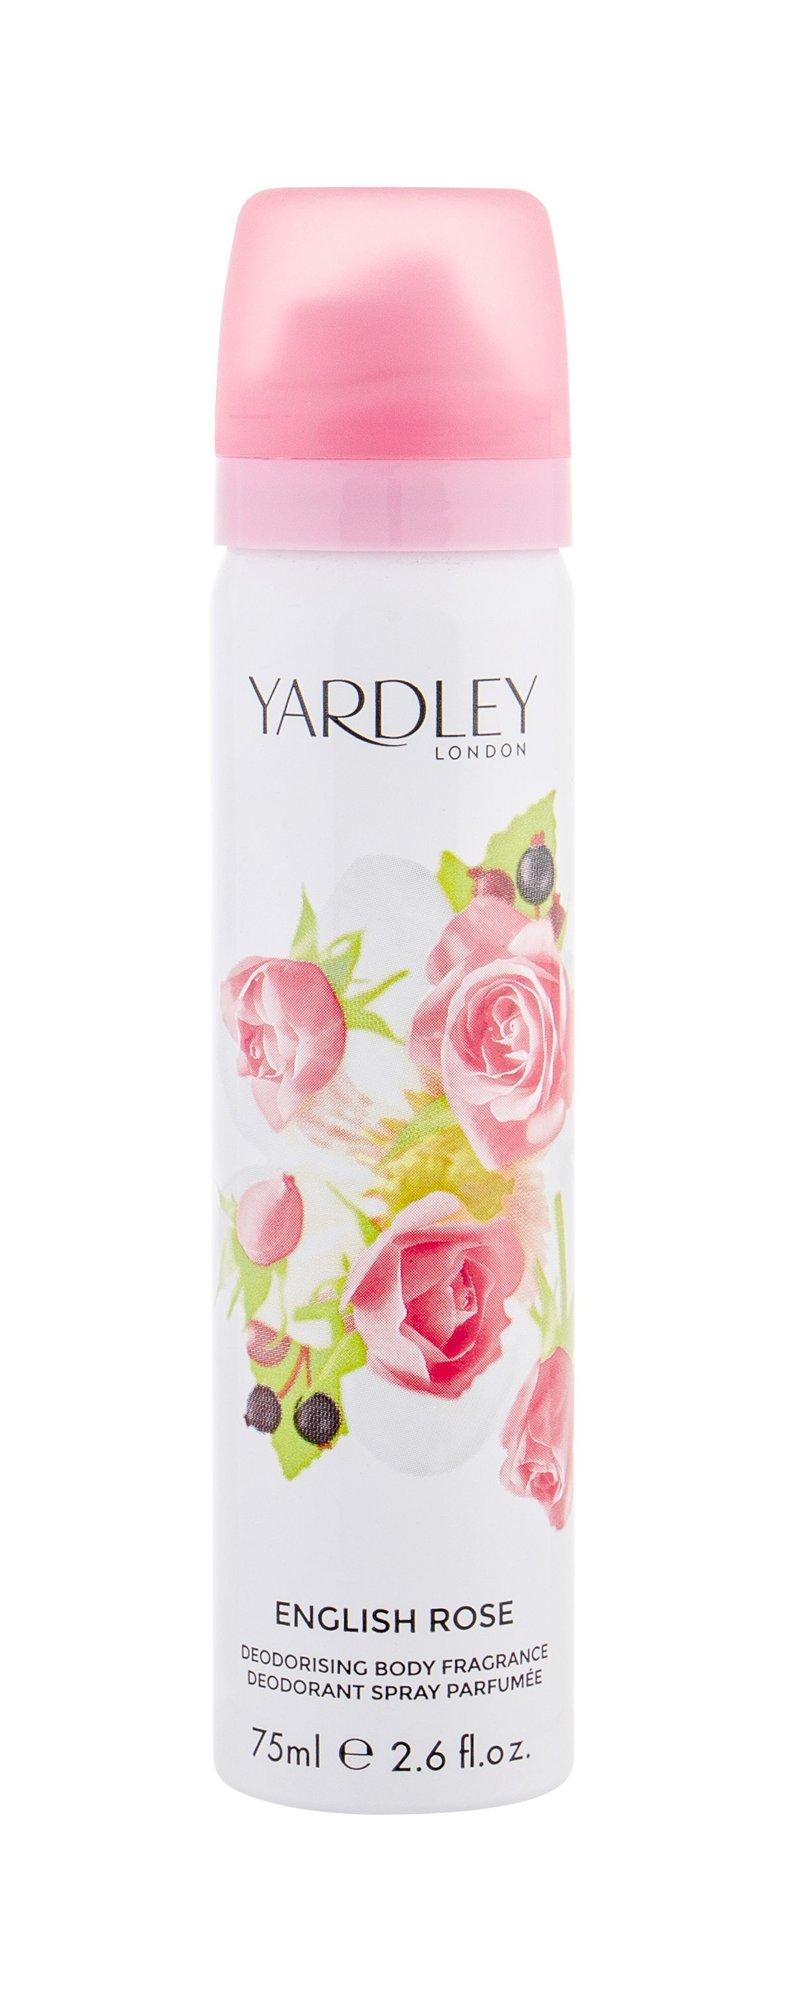 Yardley of London English Rose Deodorant 75ml